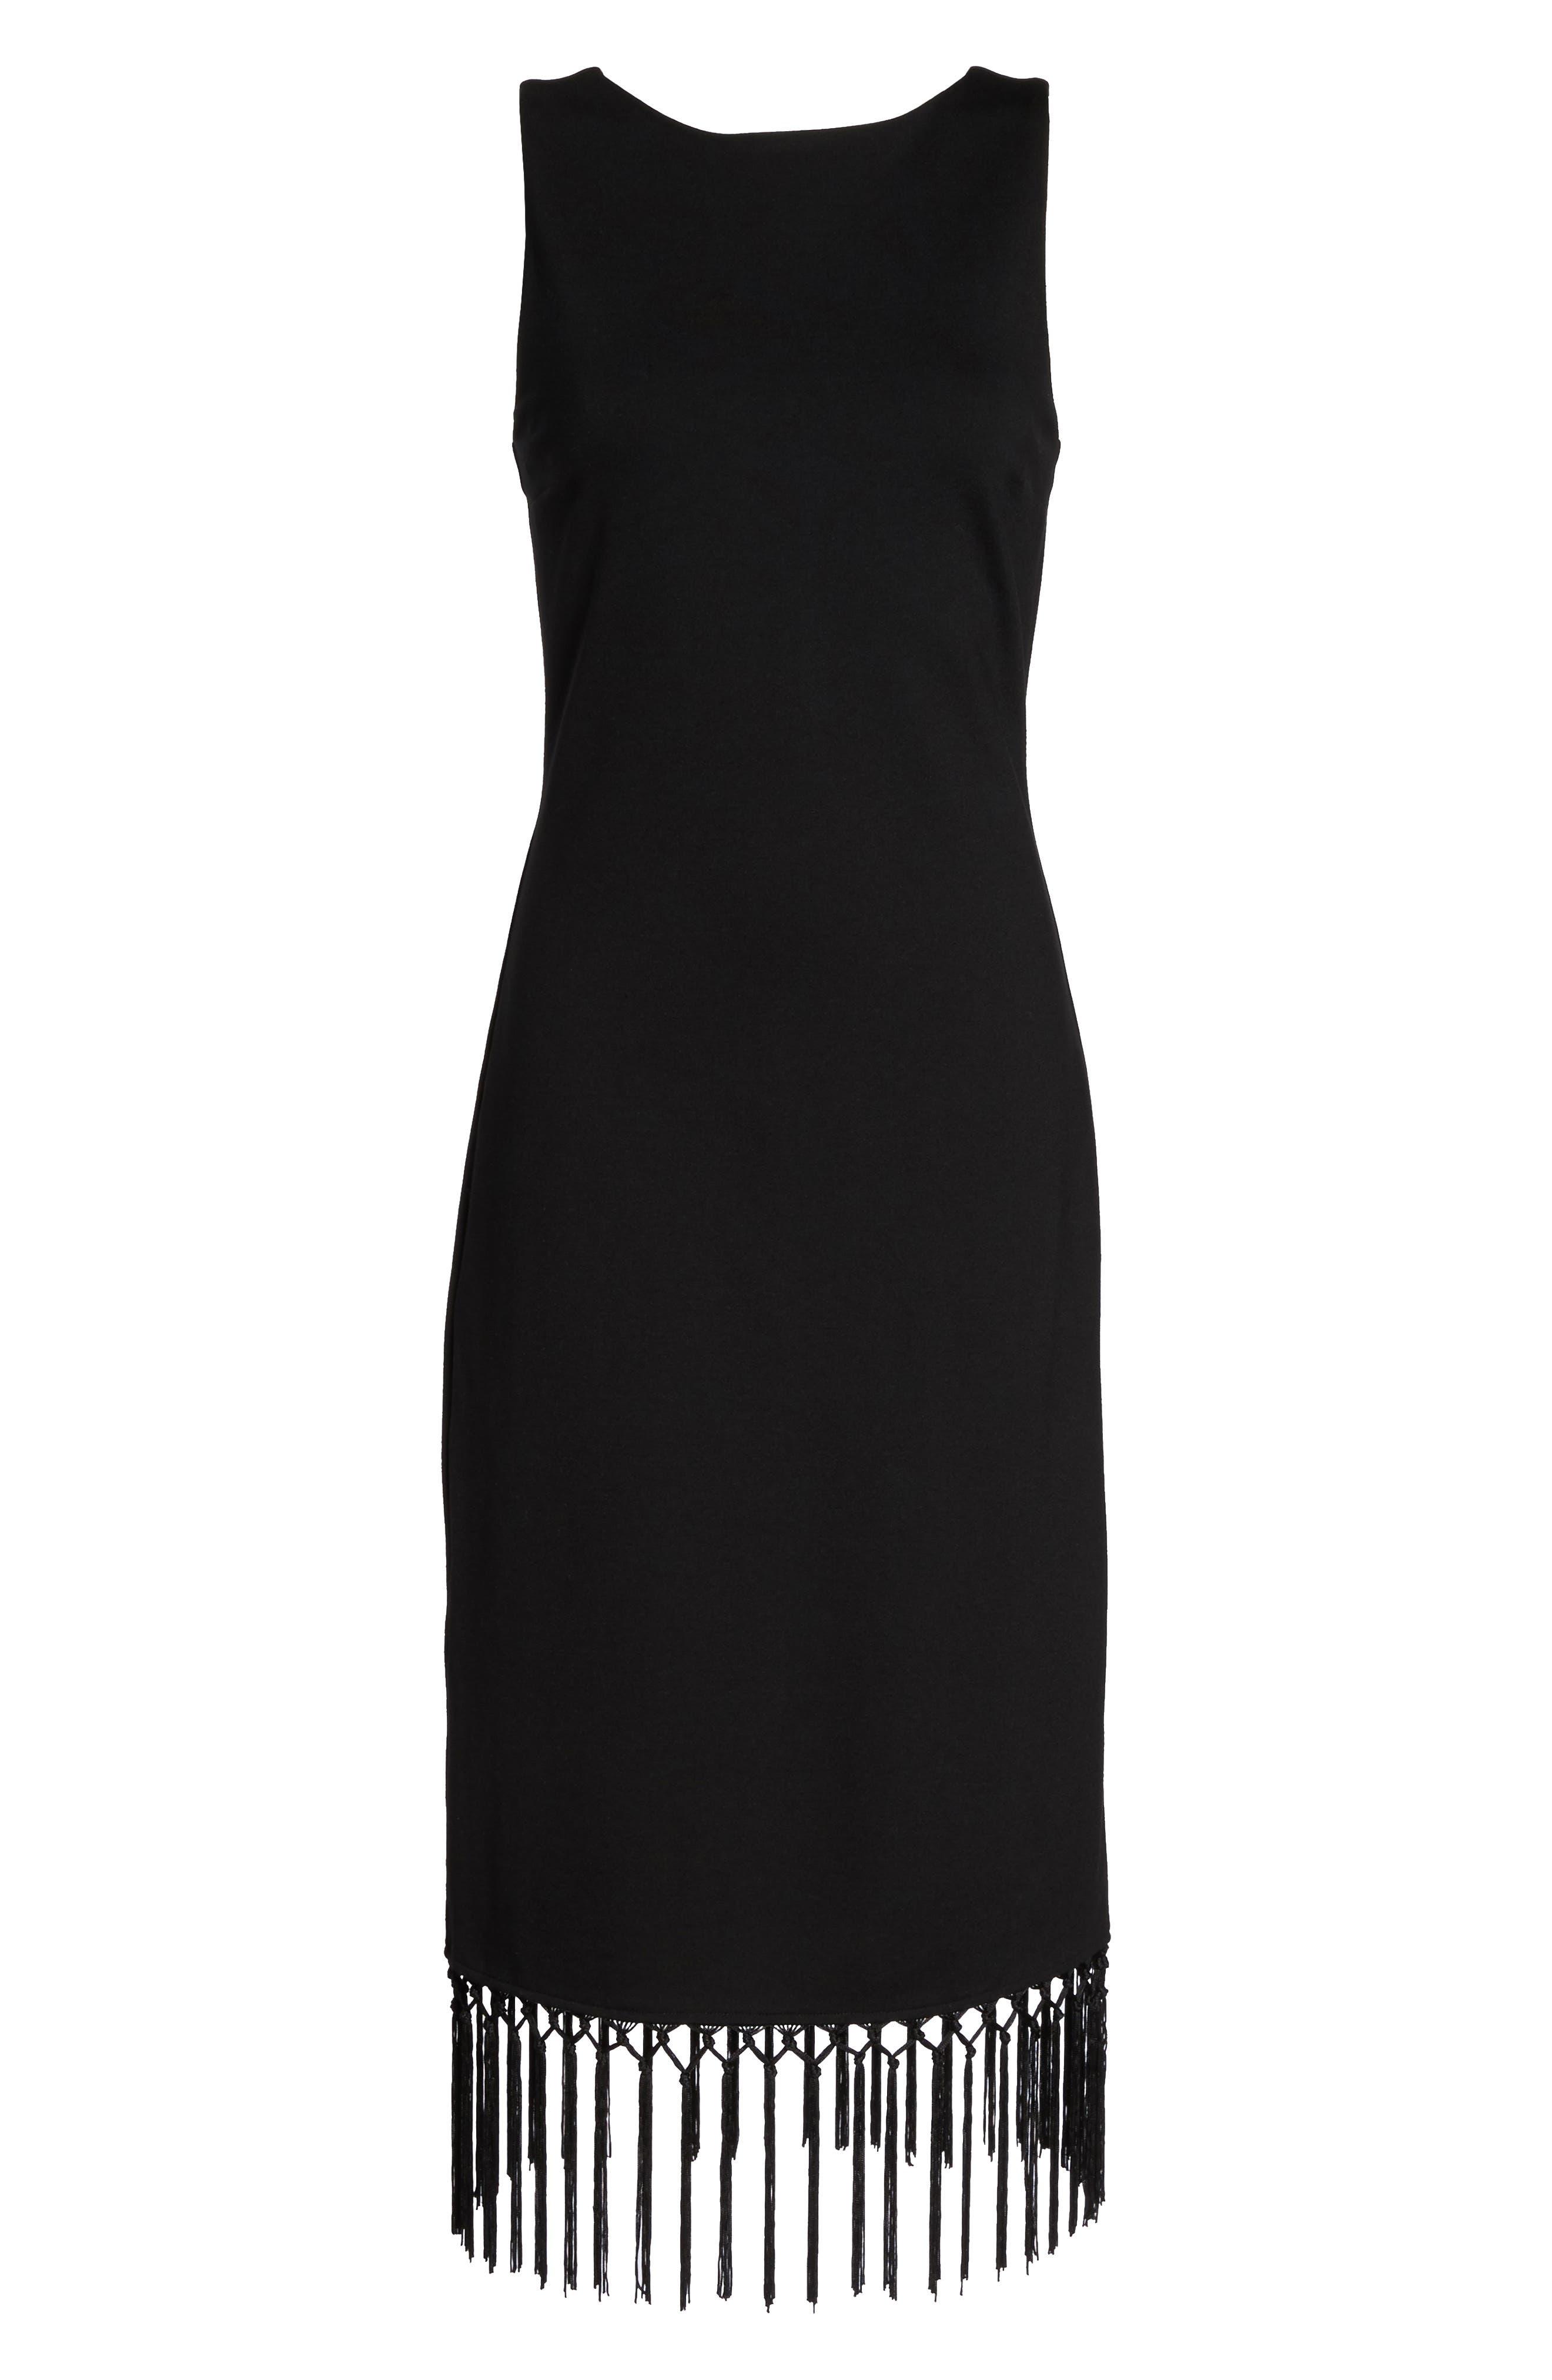 Tassel Midi Dress,                             Alternate thumbnail 6, color,                             001